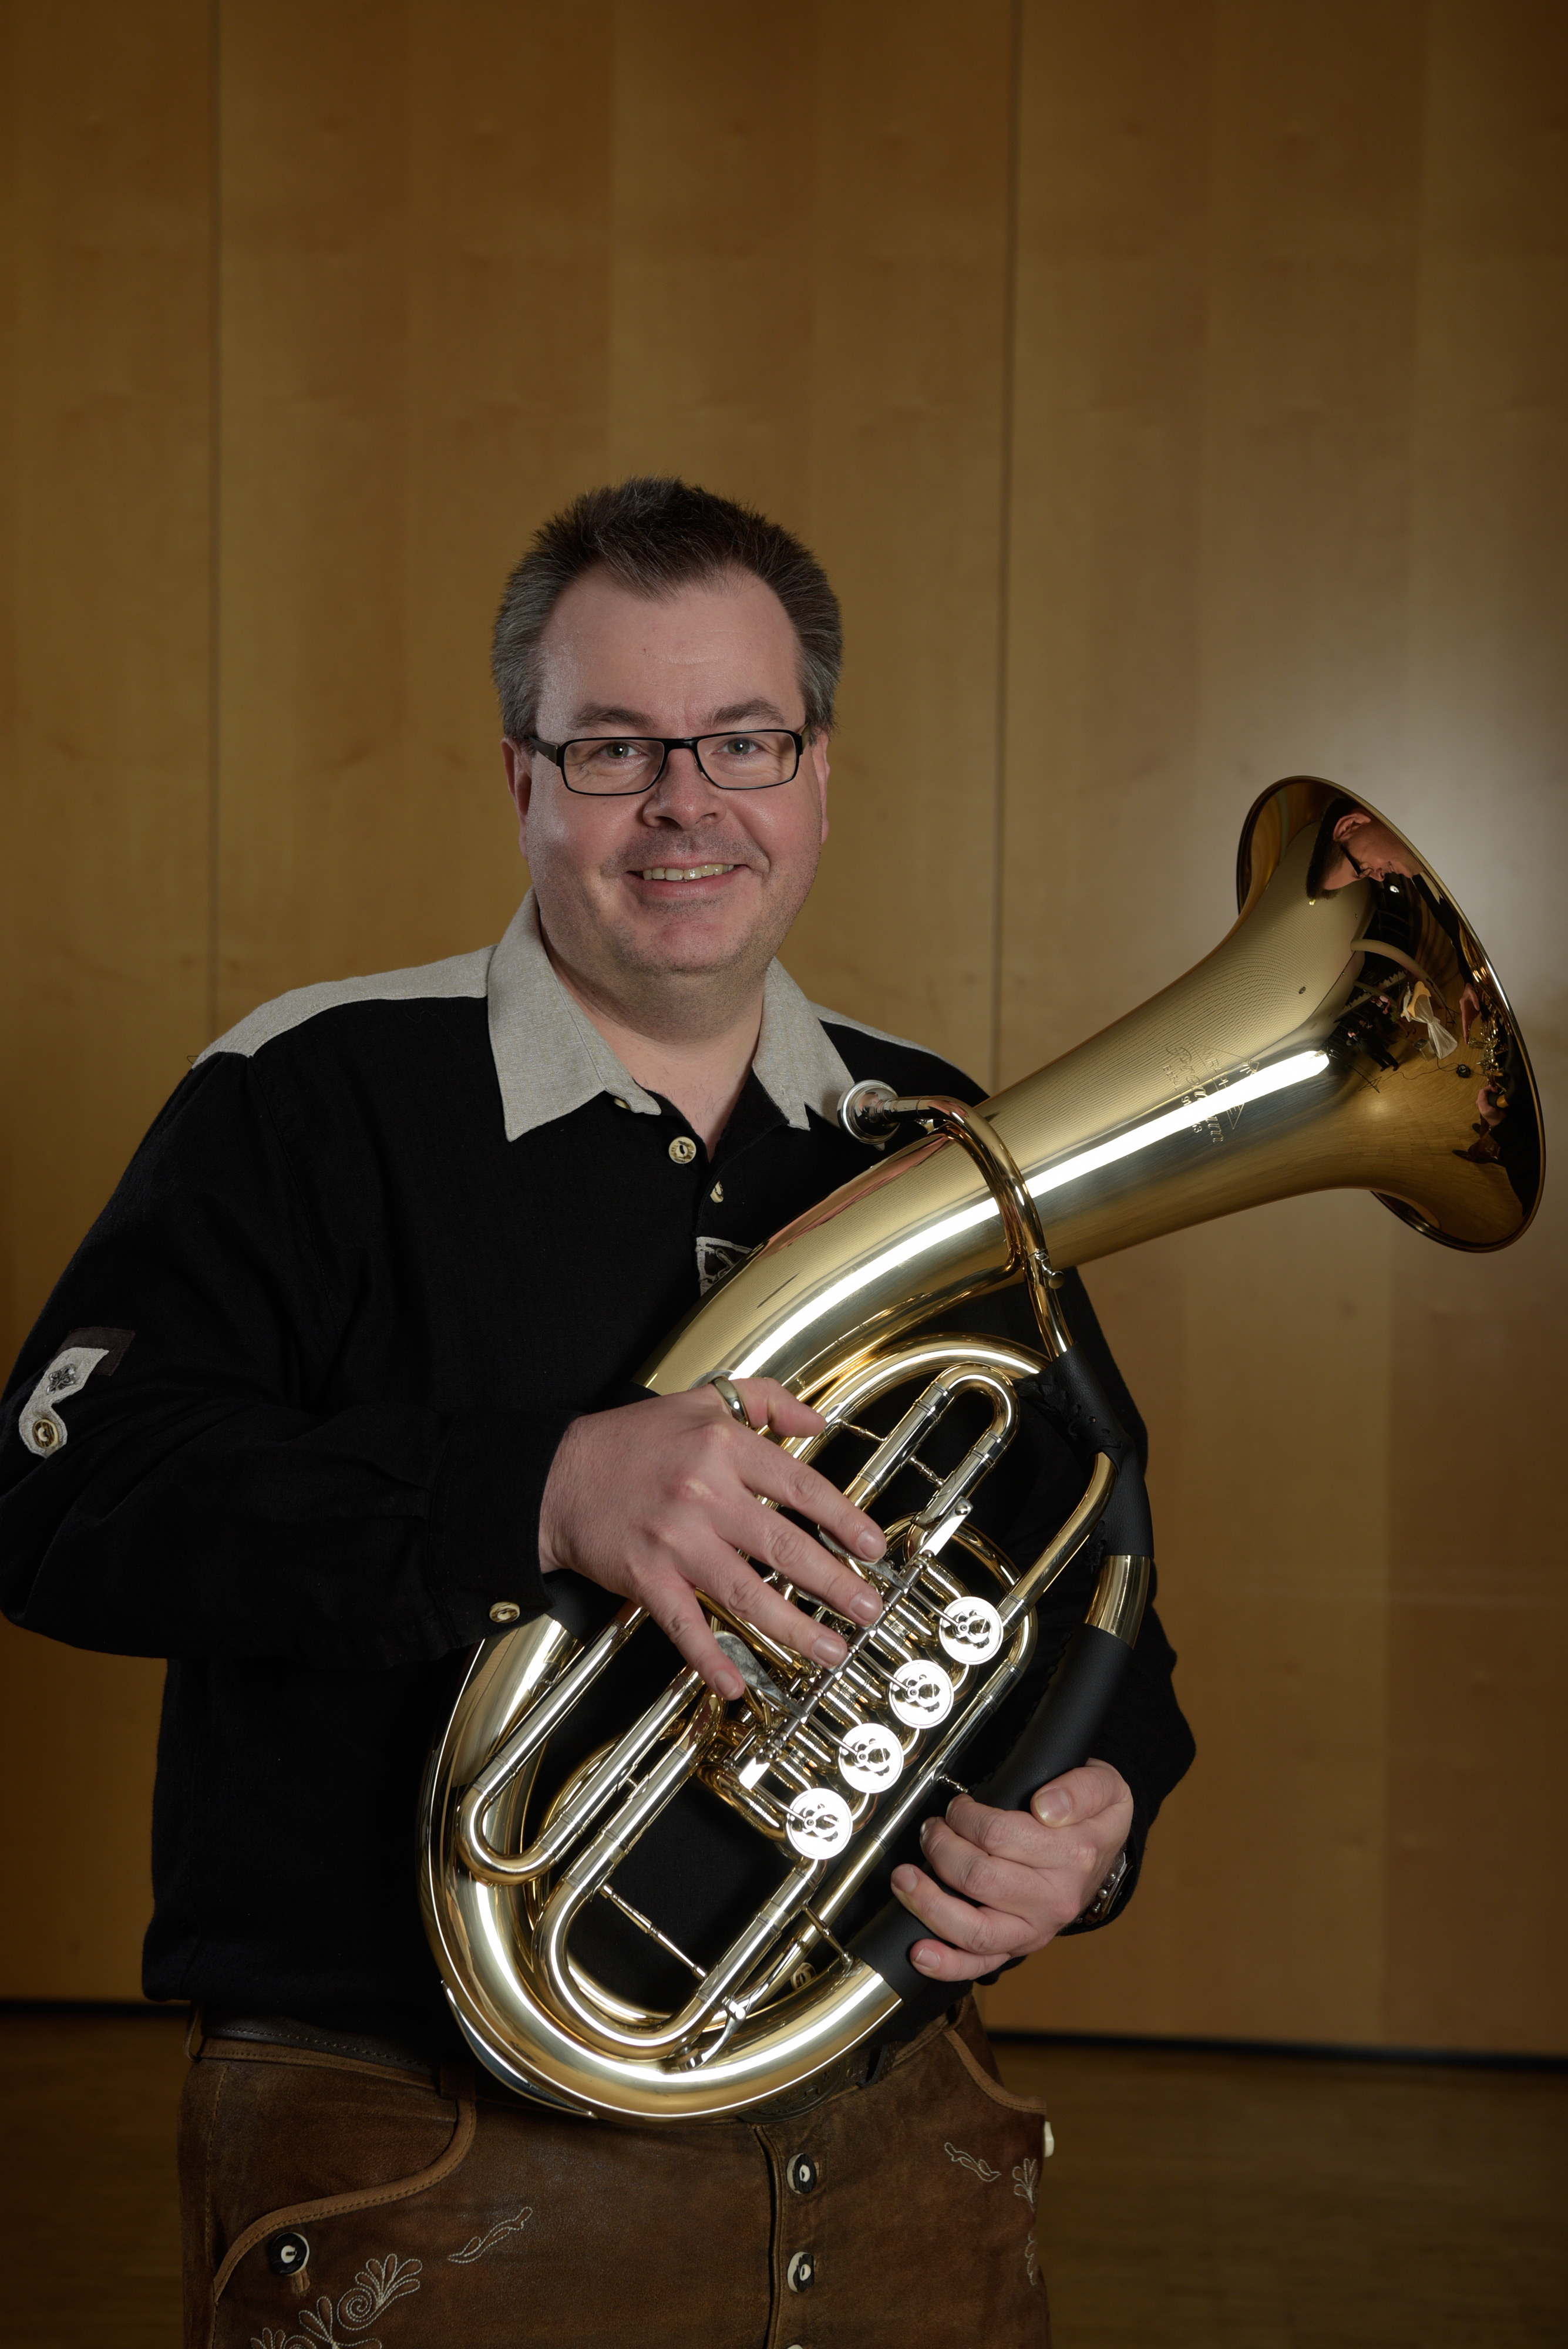 Jens Gillmann